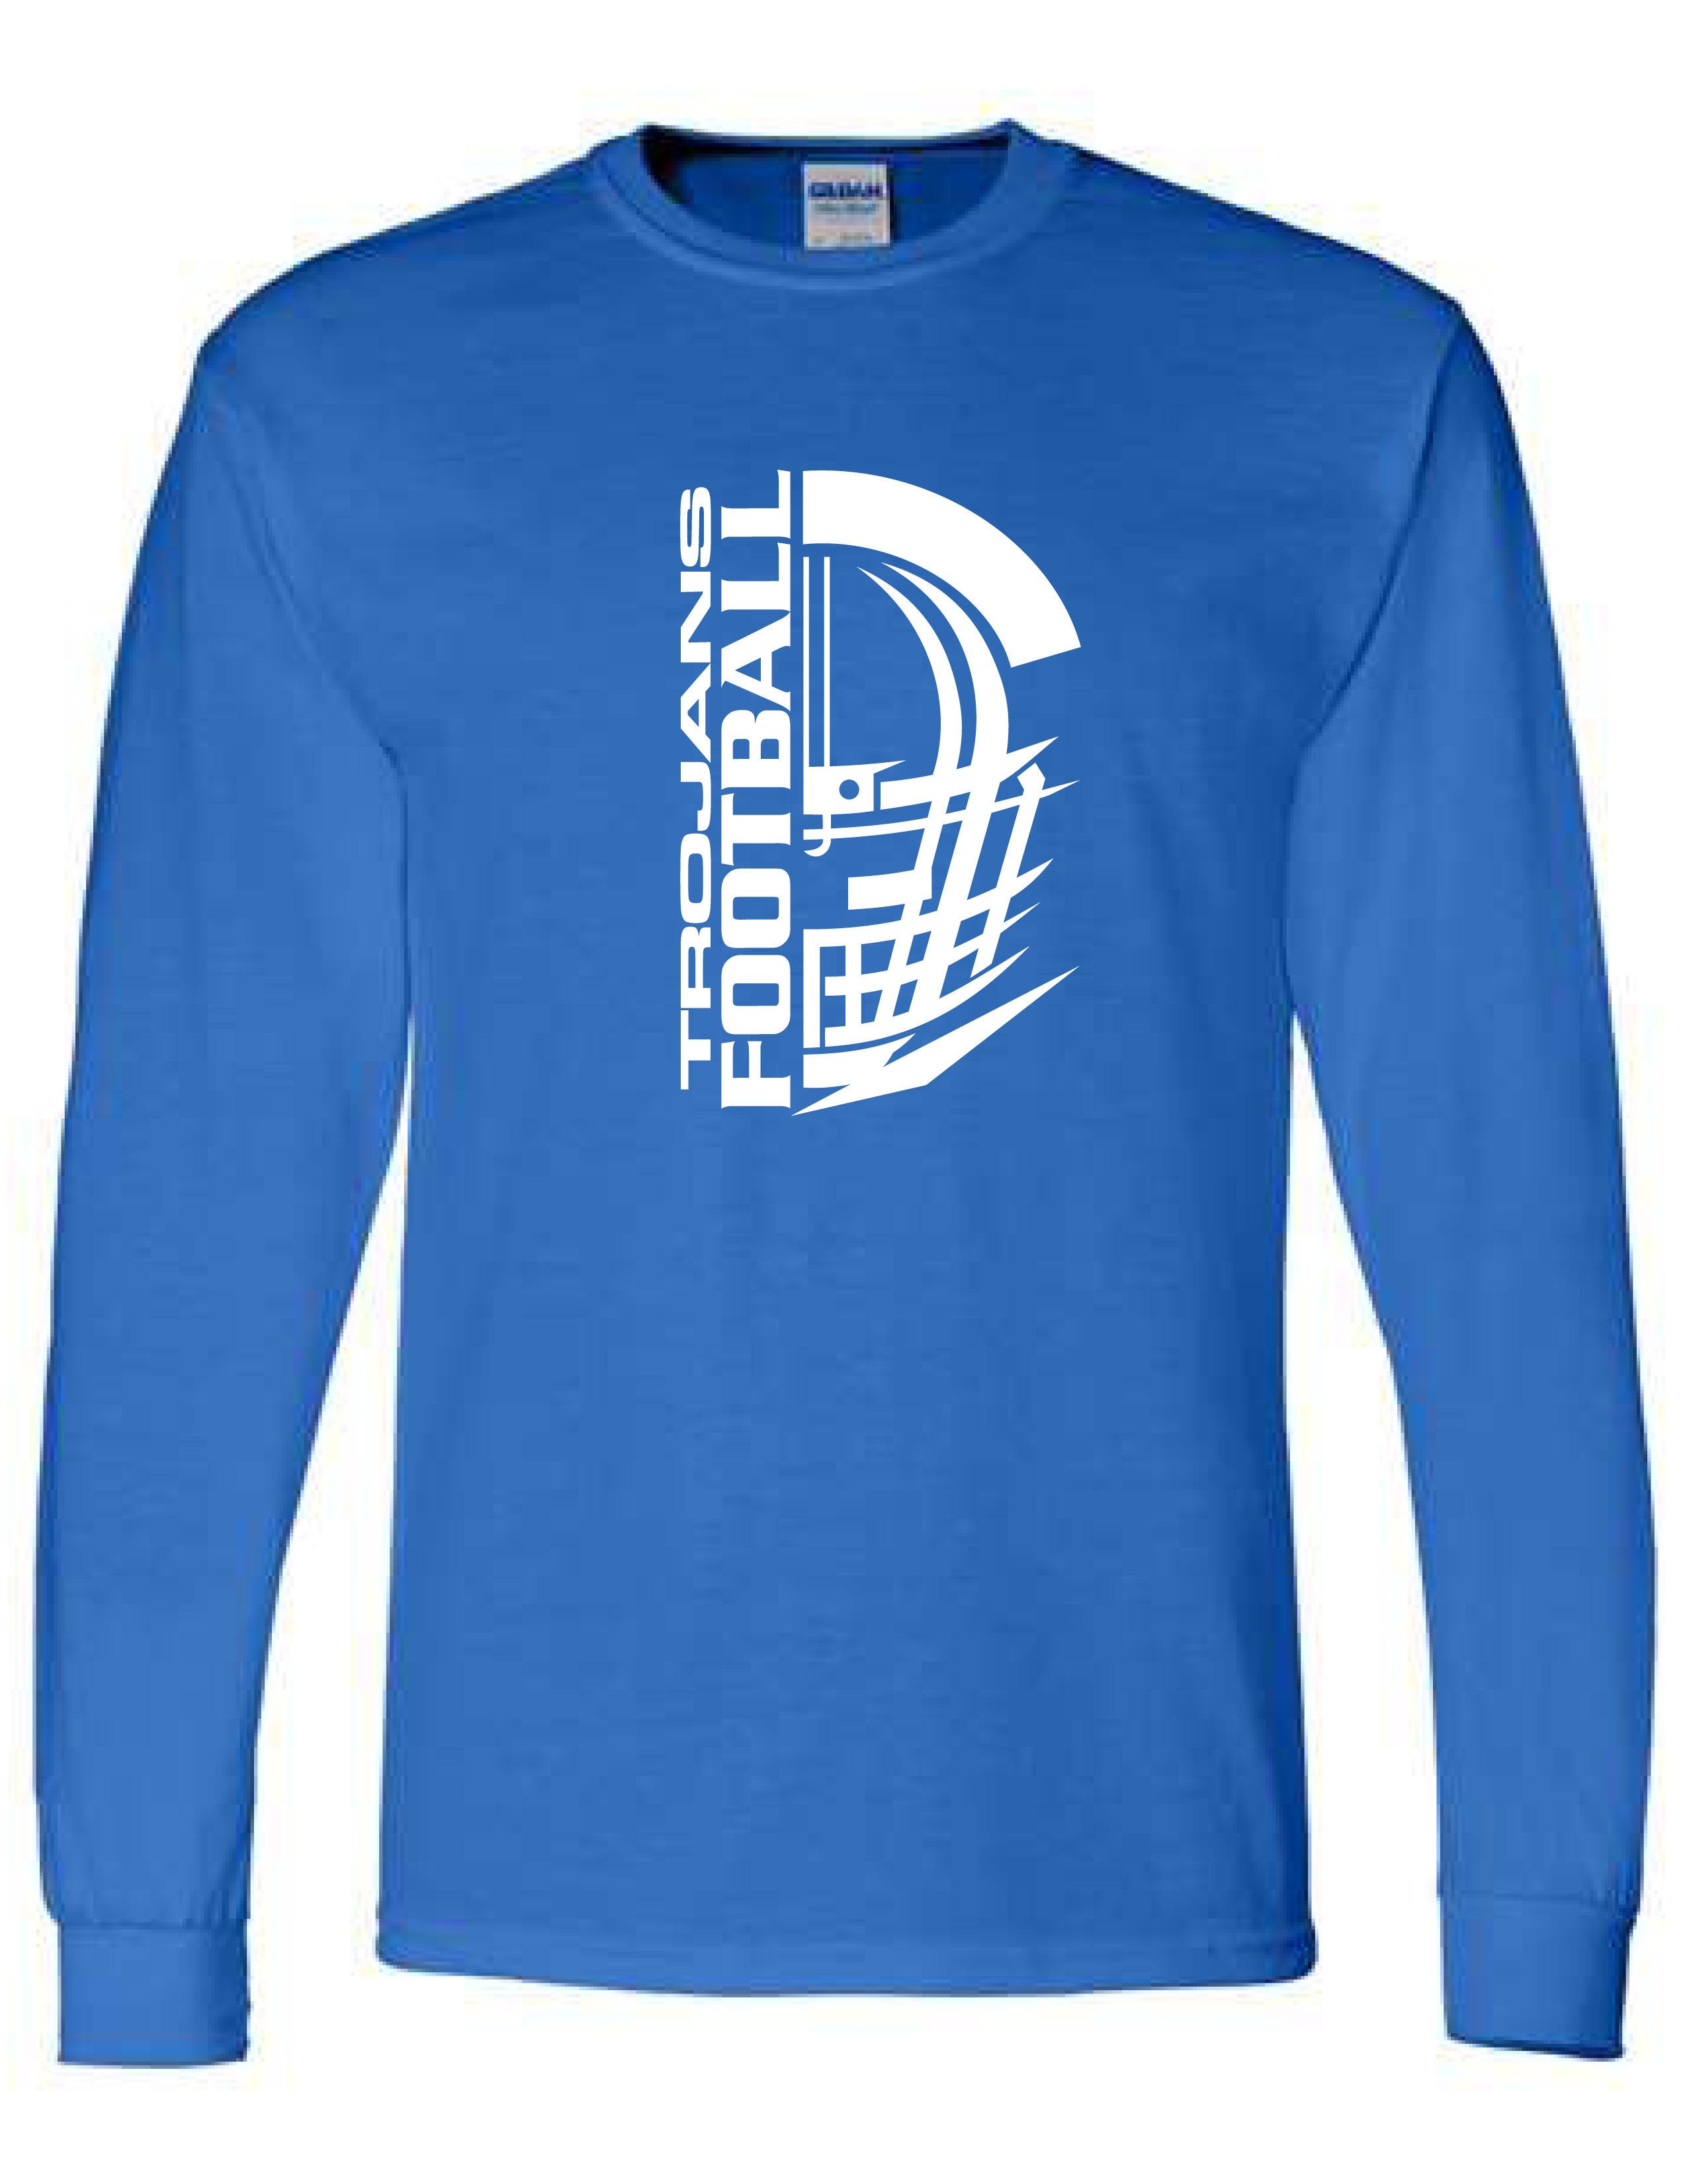 Long Sleeve T-shirt  (HELMET)